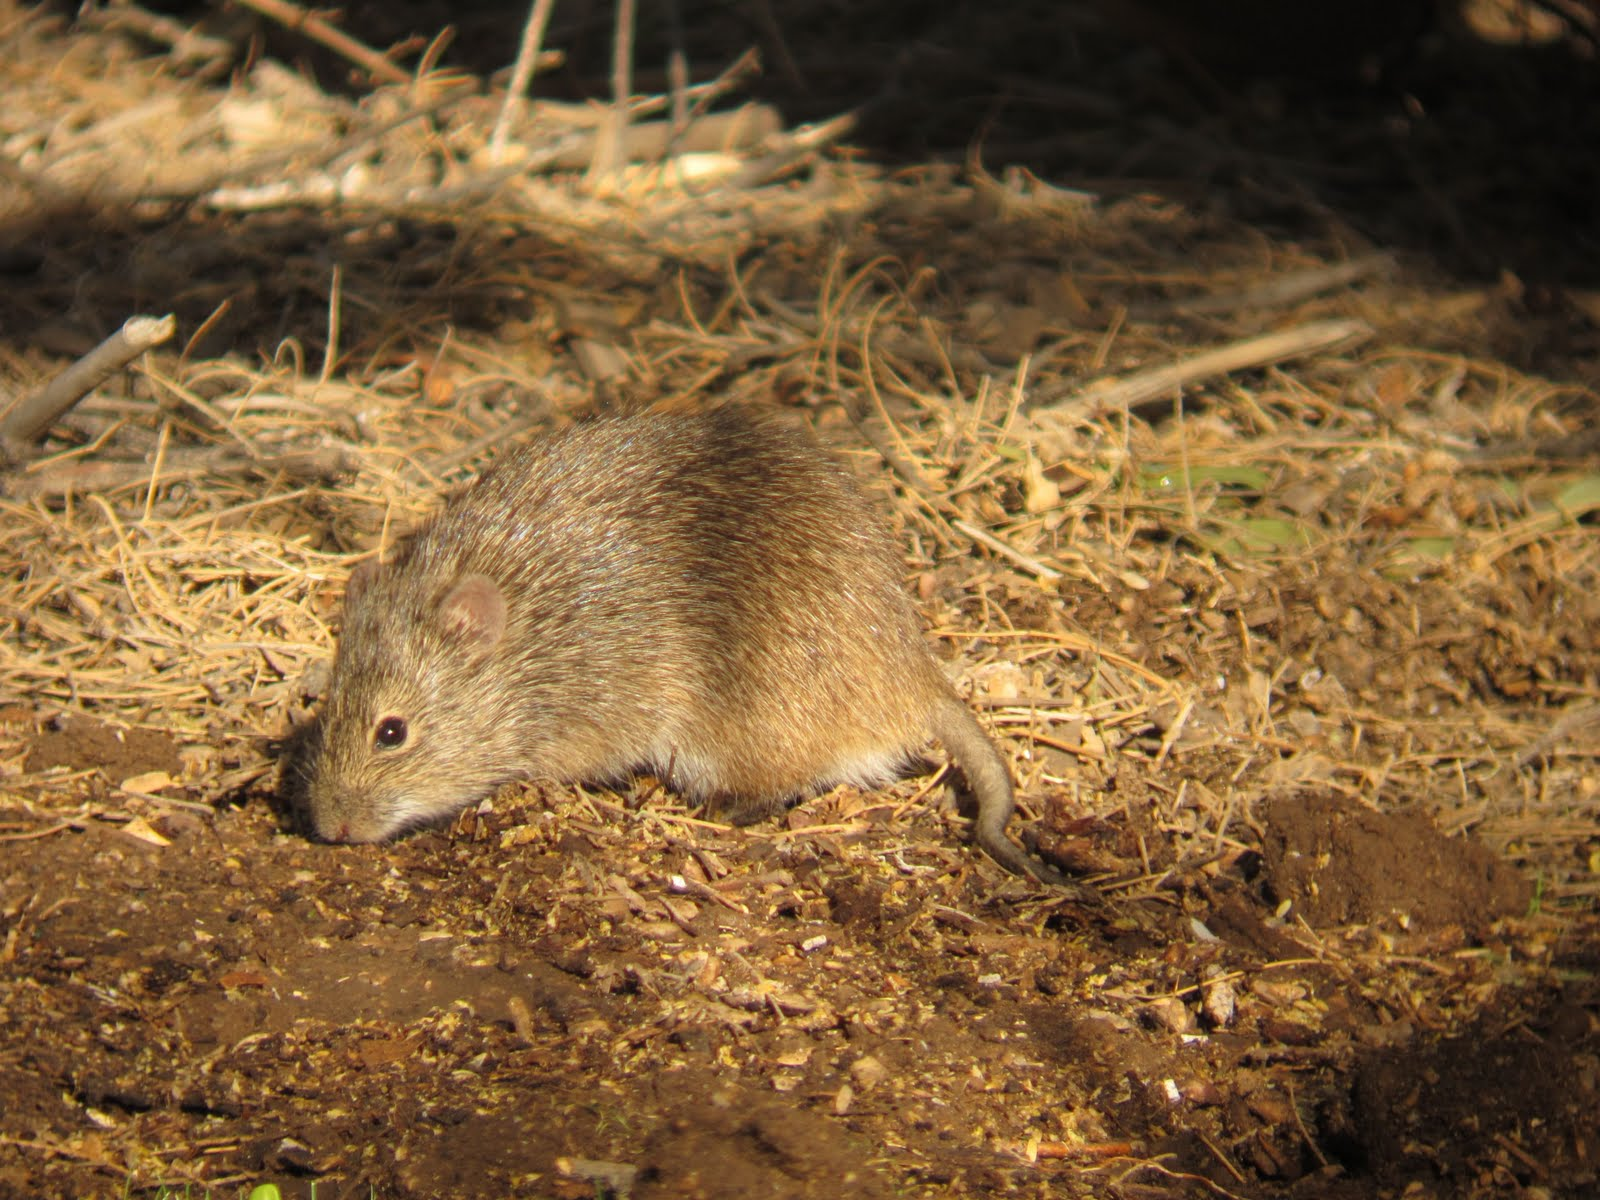 Birdernaturalist: A New Mammal for the Yard List – Arizona Cotton